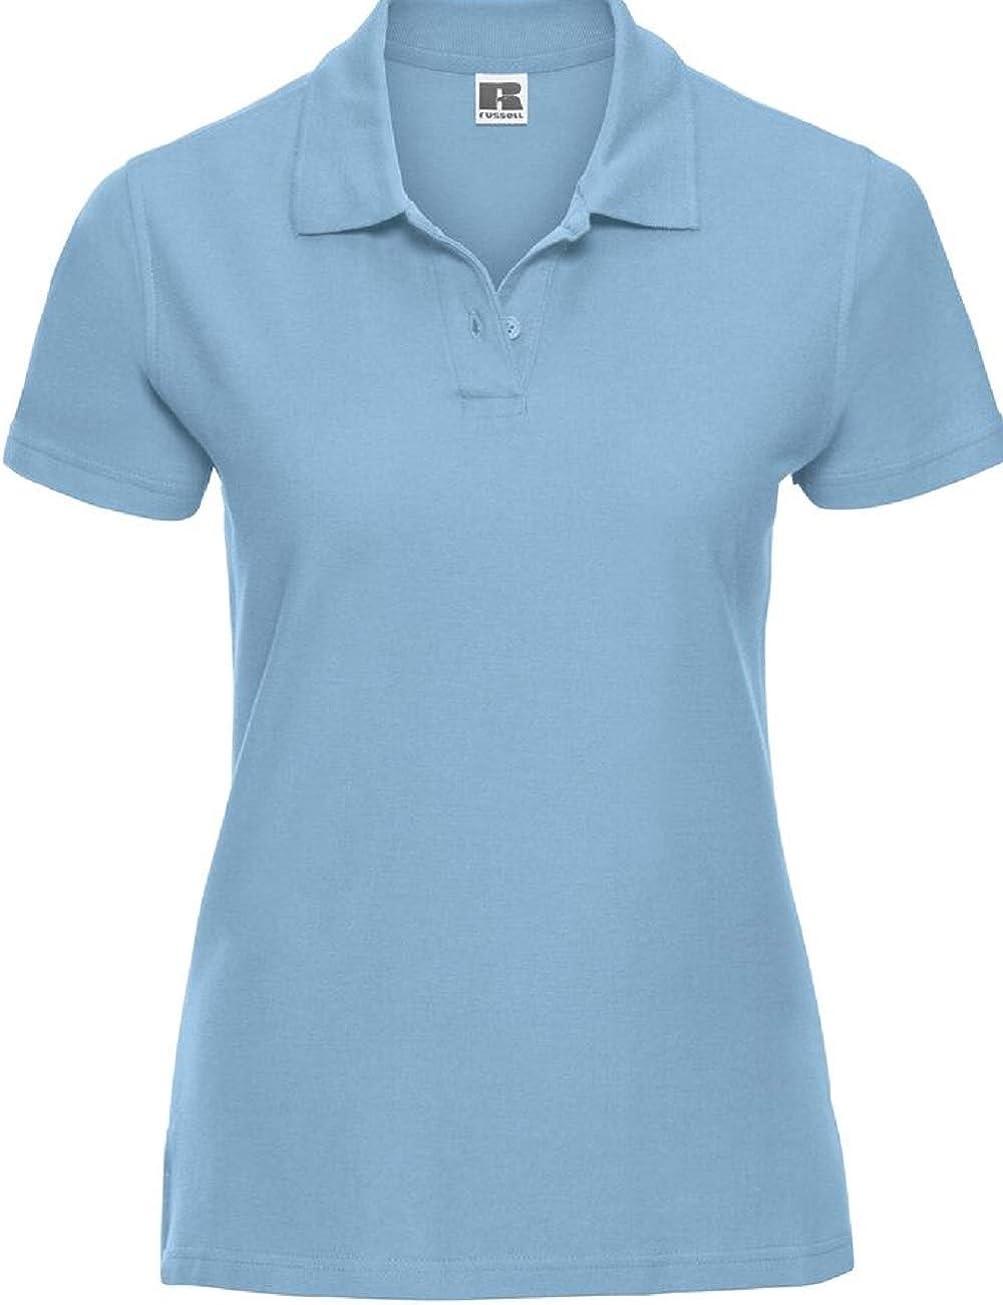 Russell Athletic - Polo - para Mujer Azul Azul Celeste S: Amazon ...